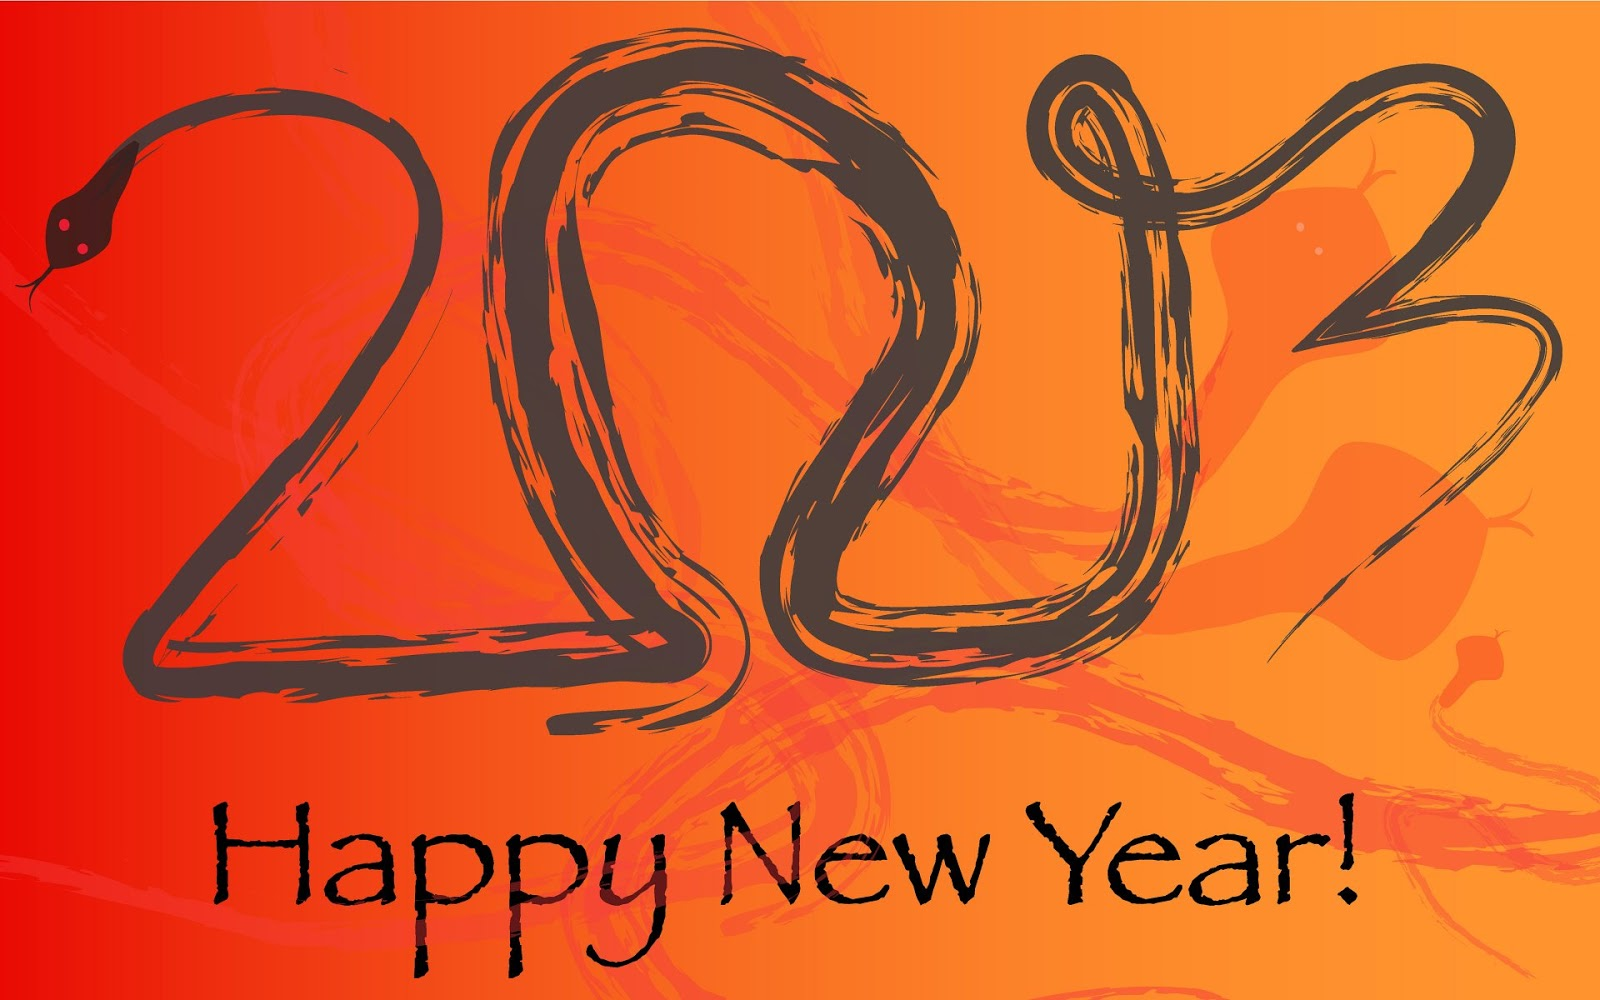 http://4.bp.blogspot.com/-bVsgtjeeFrE/UQcqpVuEXdI/AAAAAAAAIDc/Guu-9UmlZkA/s1600/happy_new_year_2013-1920x1200.jpg